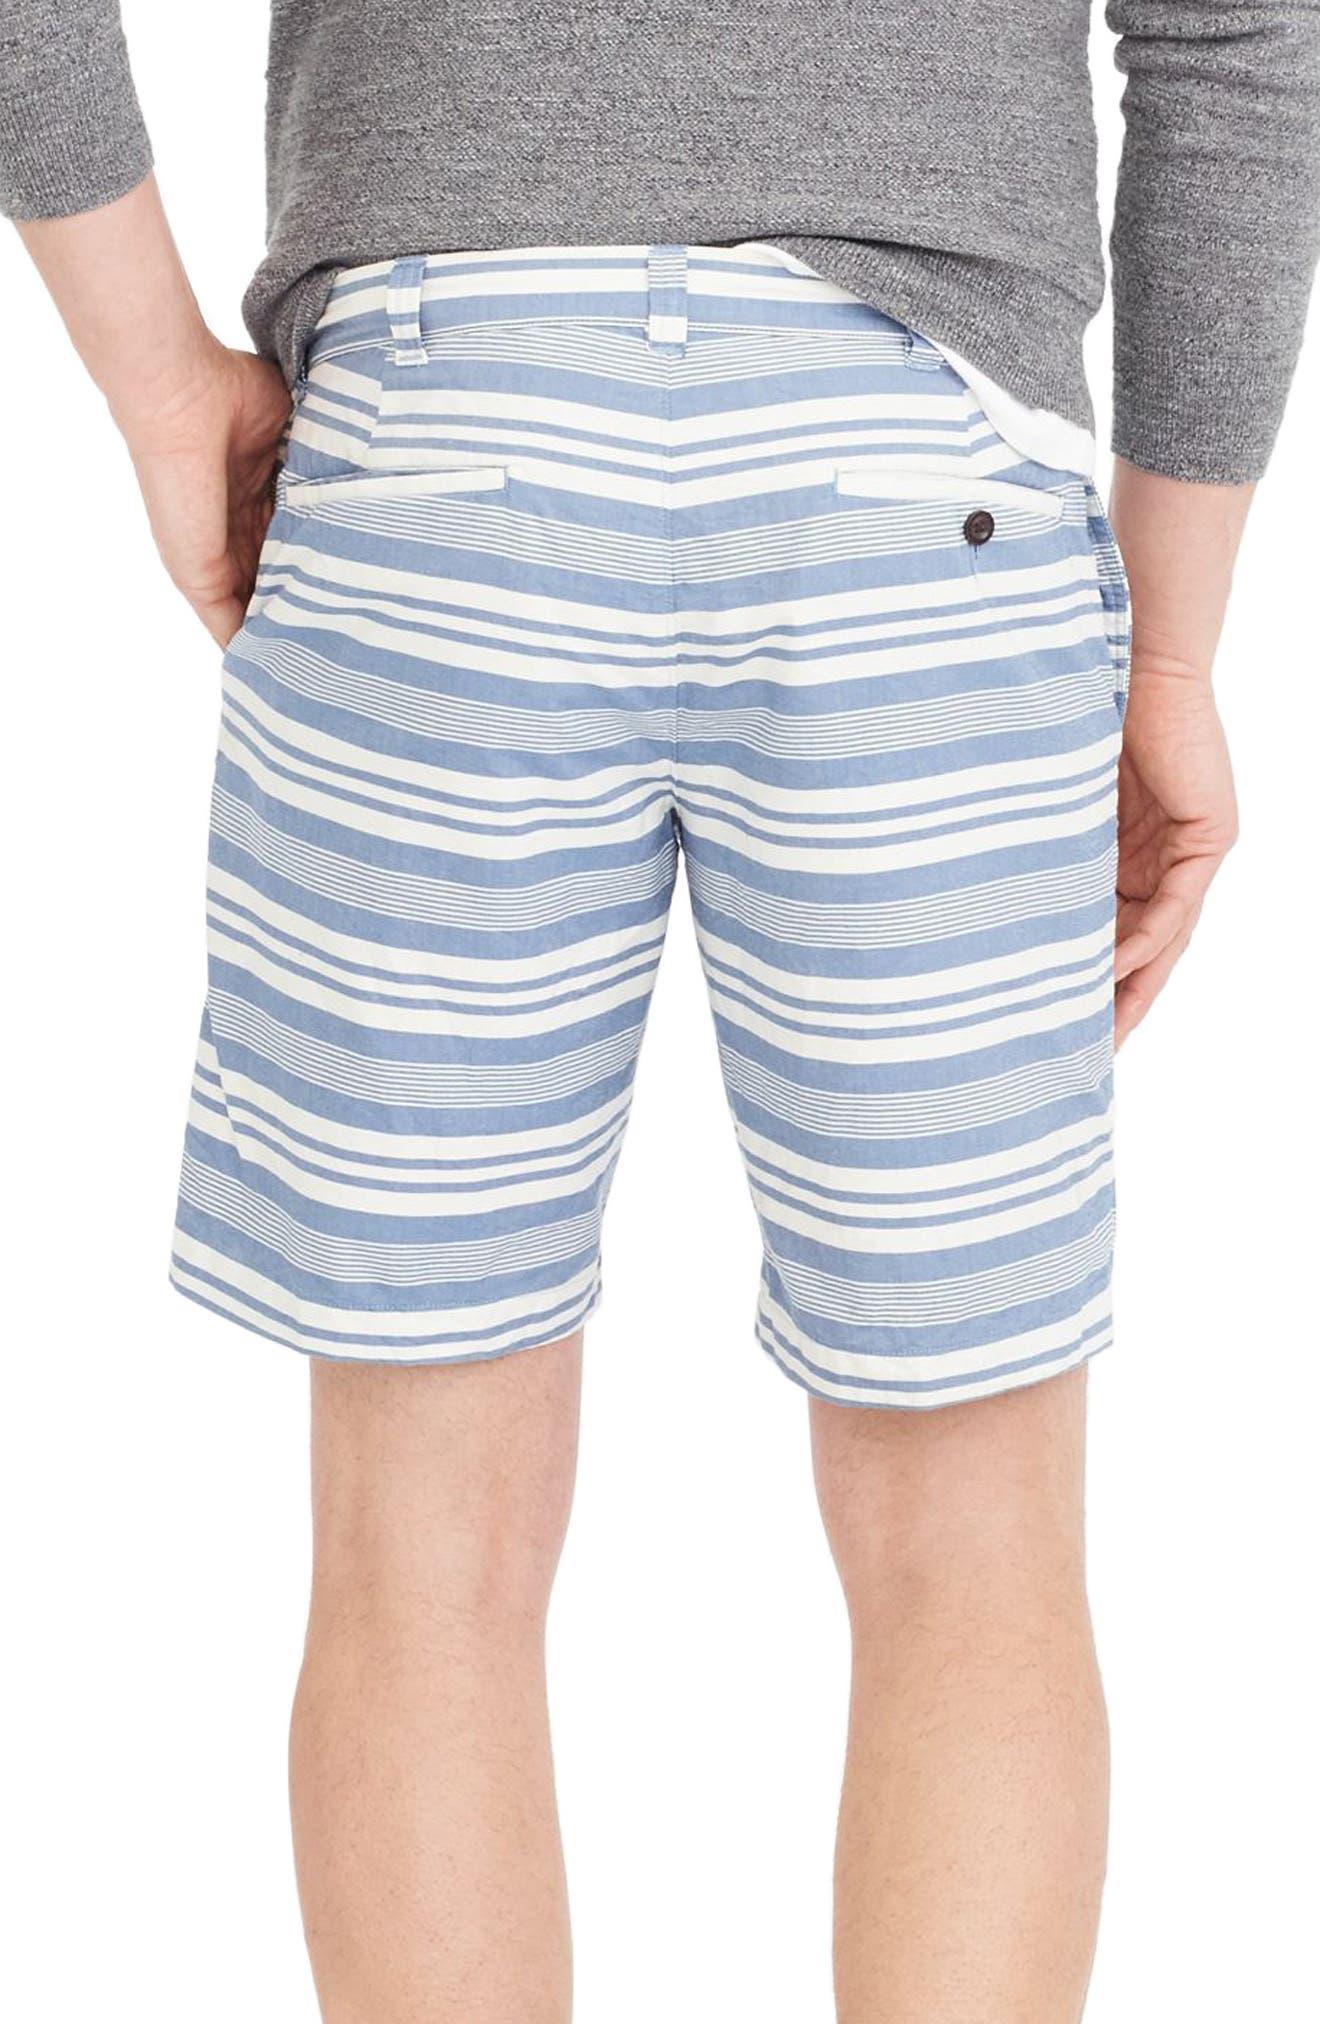 Stripe Oxford Shorts,                             Alternate thumbnail 2, color,                             White/ Blue